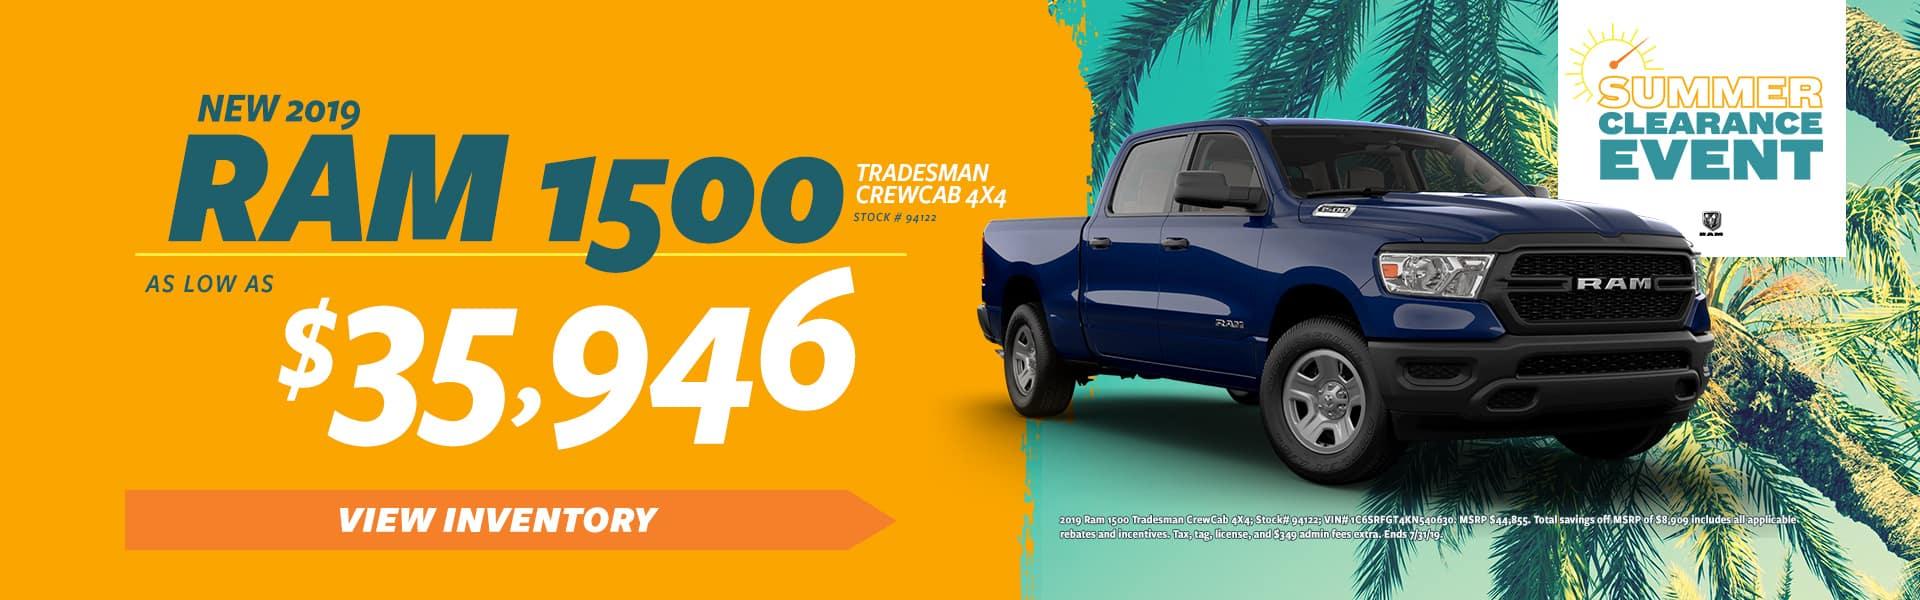 New 2019 Ram 1500!